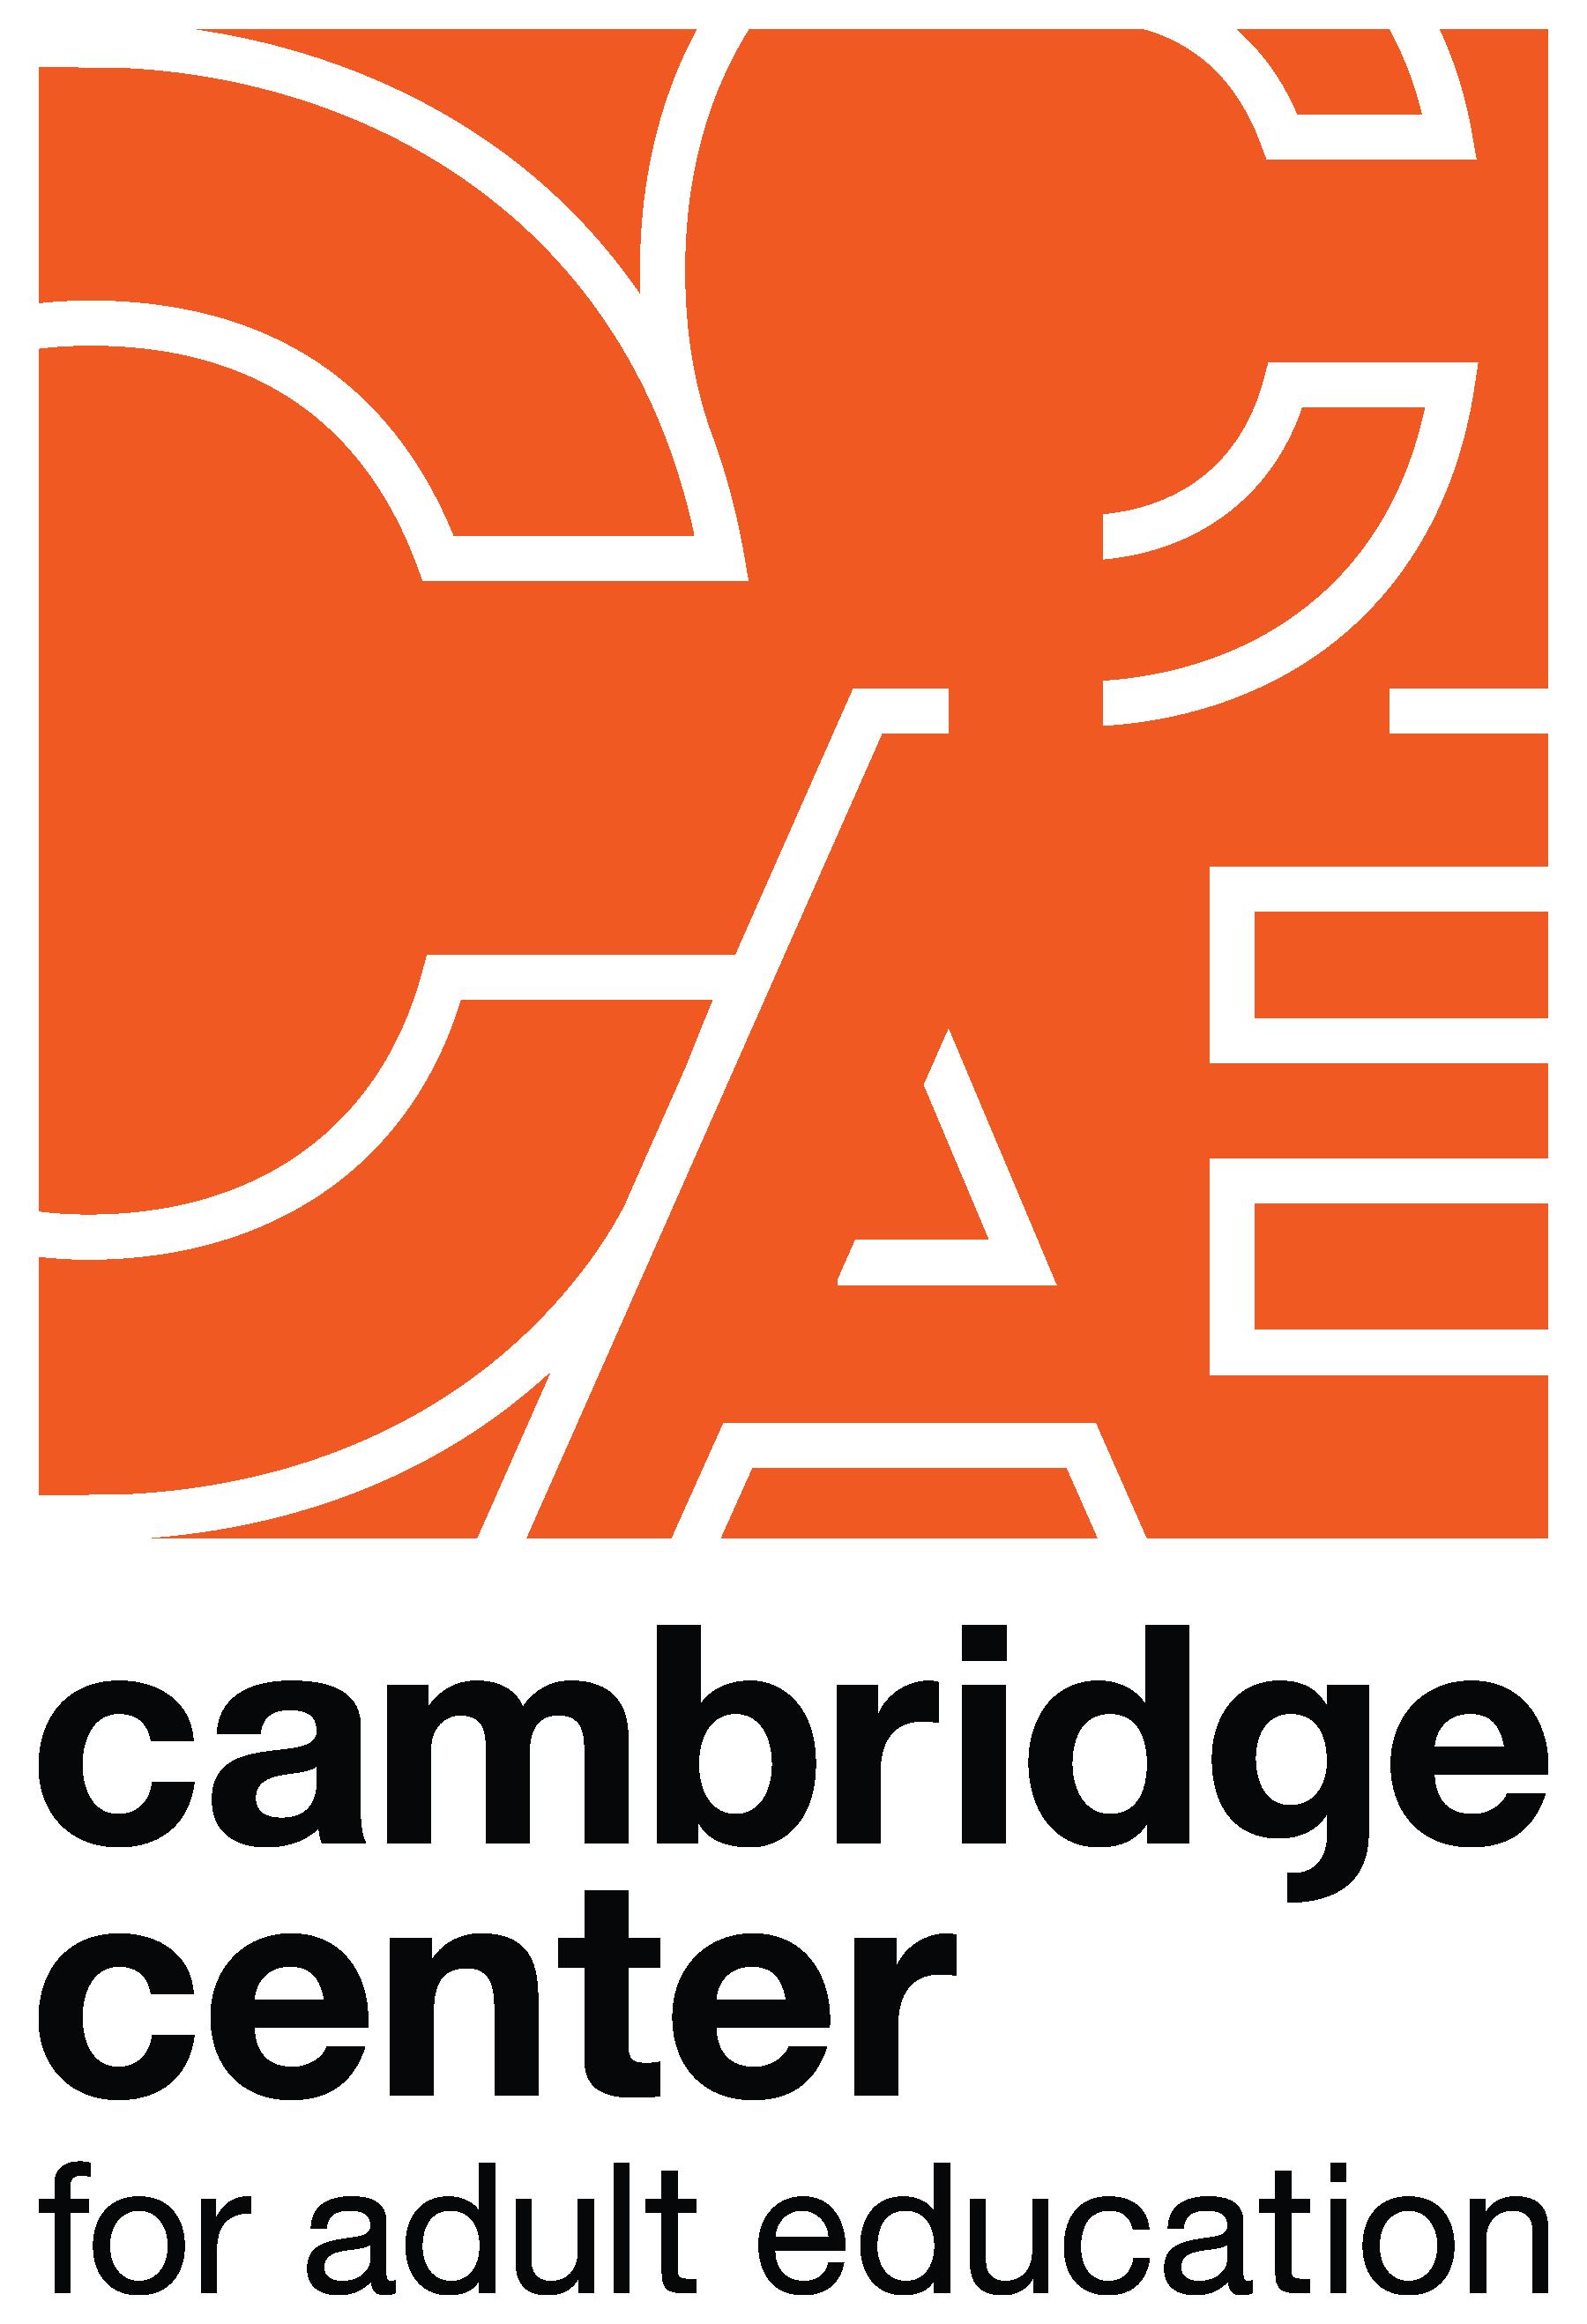 CCAE_3_Orange_lg.png